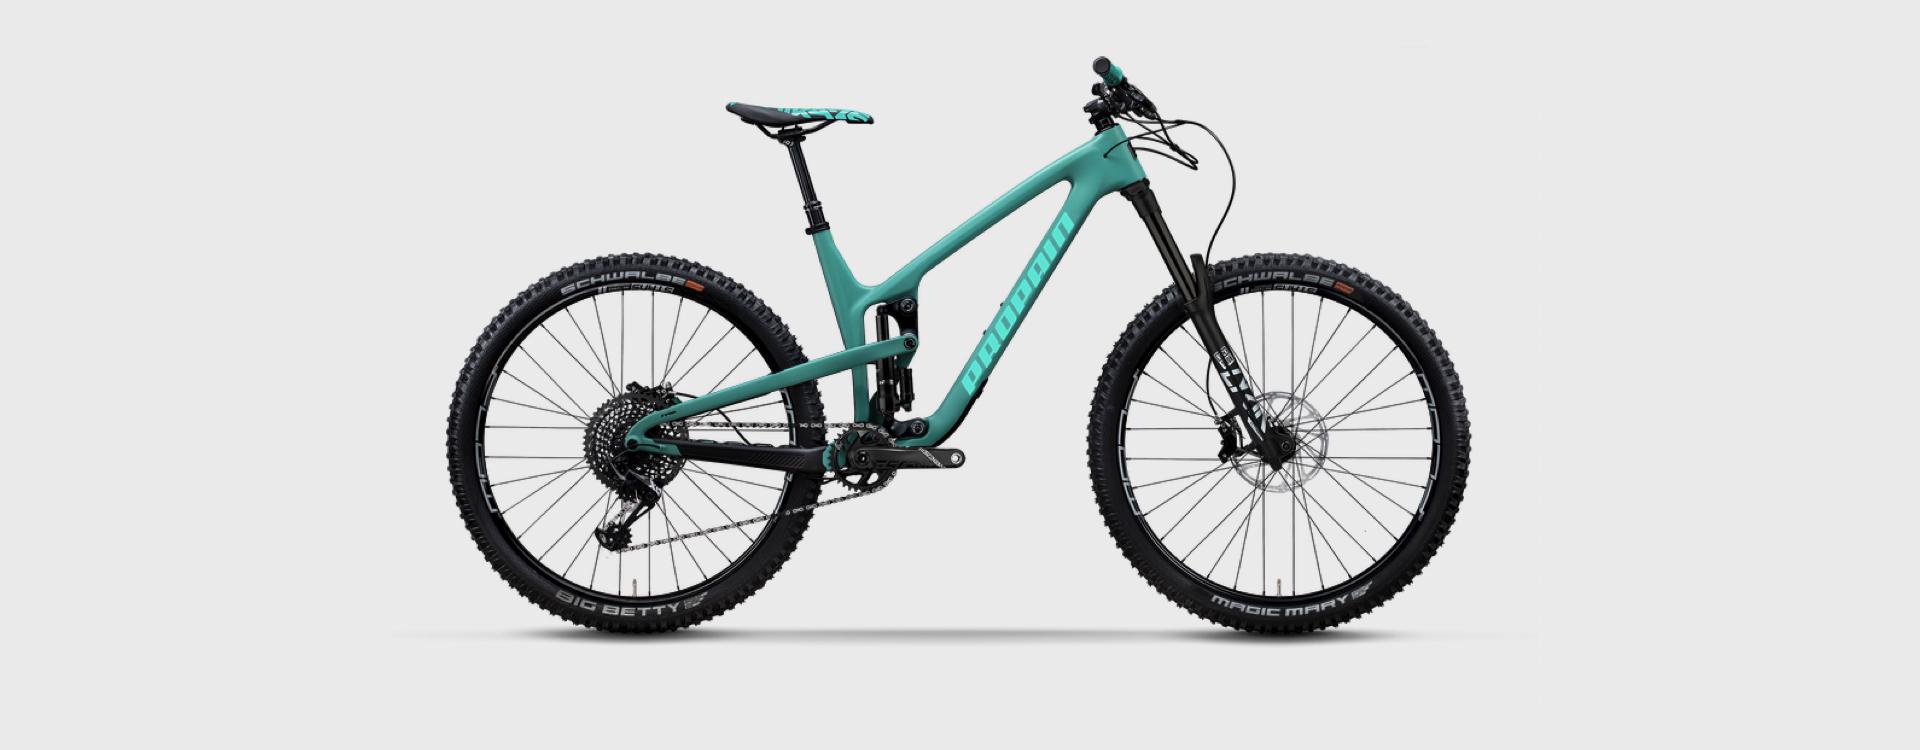 Bike Verleih Gummersbach Propain Bikes Testcenter NRW Tyee 2 - CF - M - 29 - Badmint - 1920x750